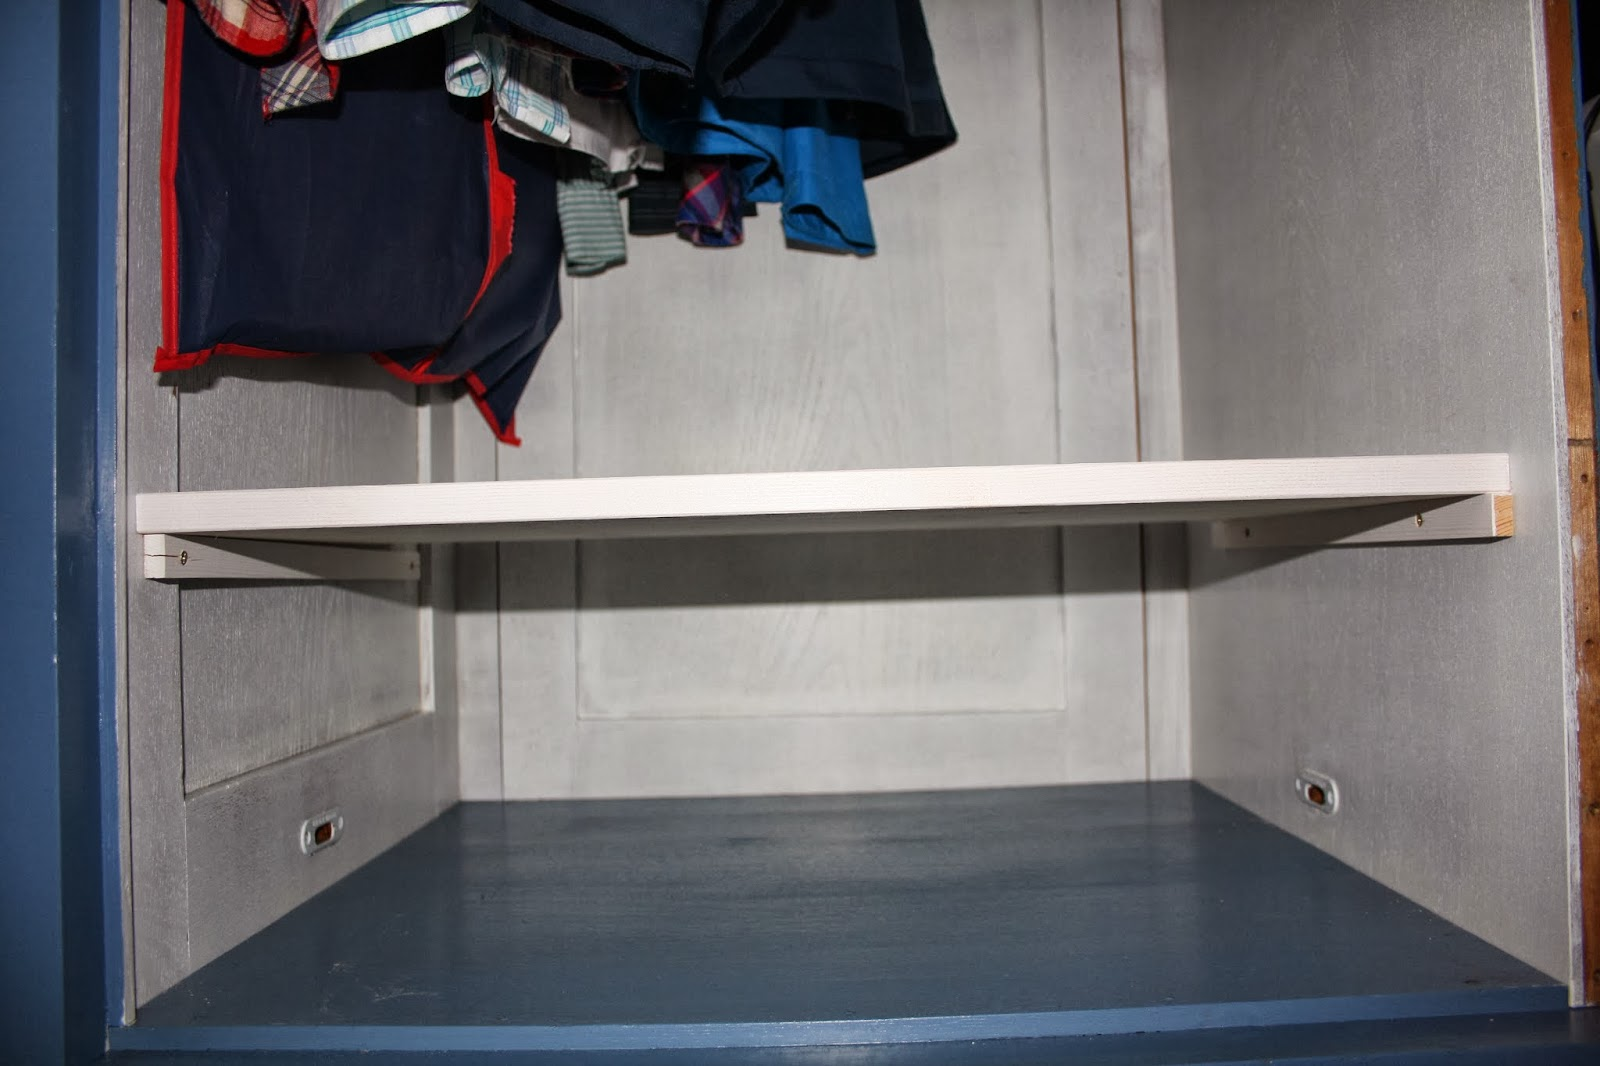 recyceln wir machen wir selbst fifties closet refresh friesenfrische 50er kleiderschrank. Black Bedroom Furniture Sets. Home Design Ideas